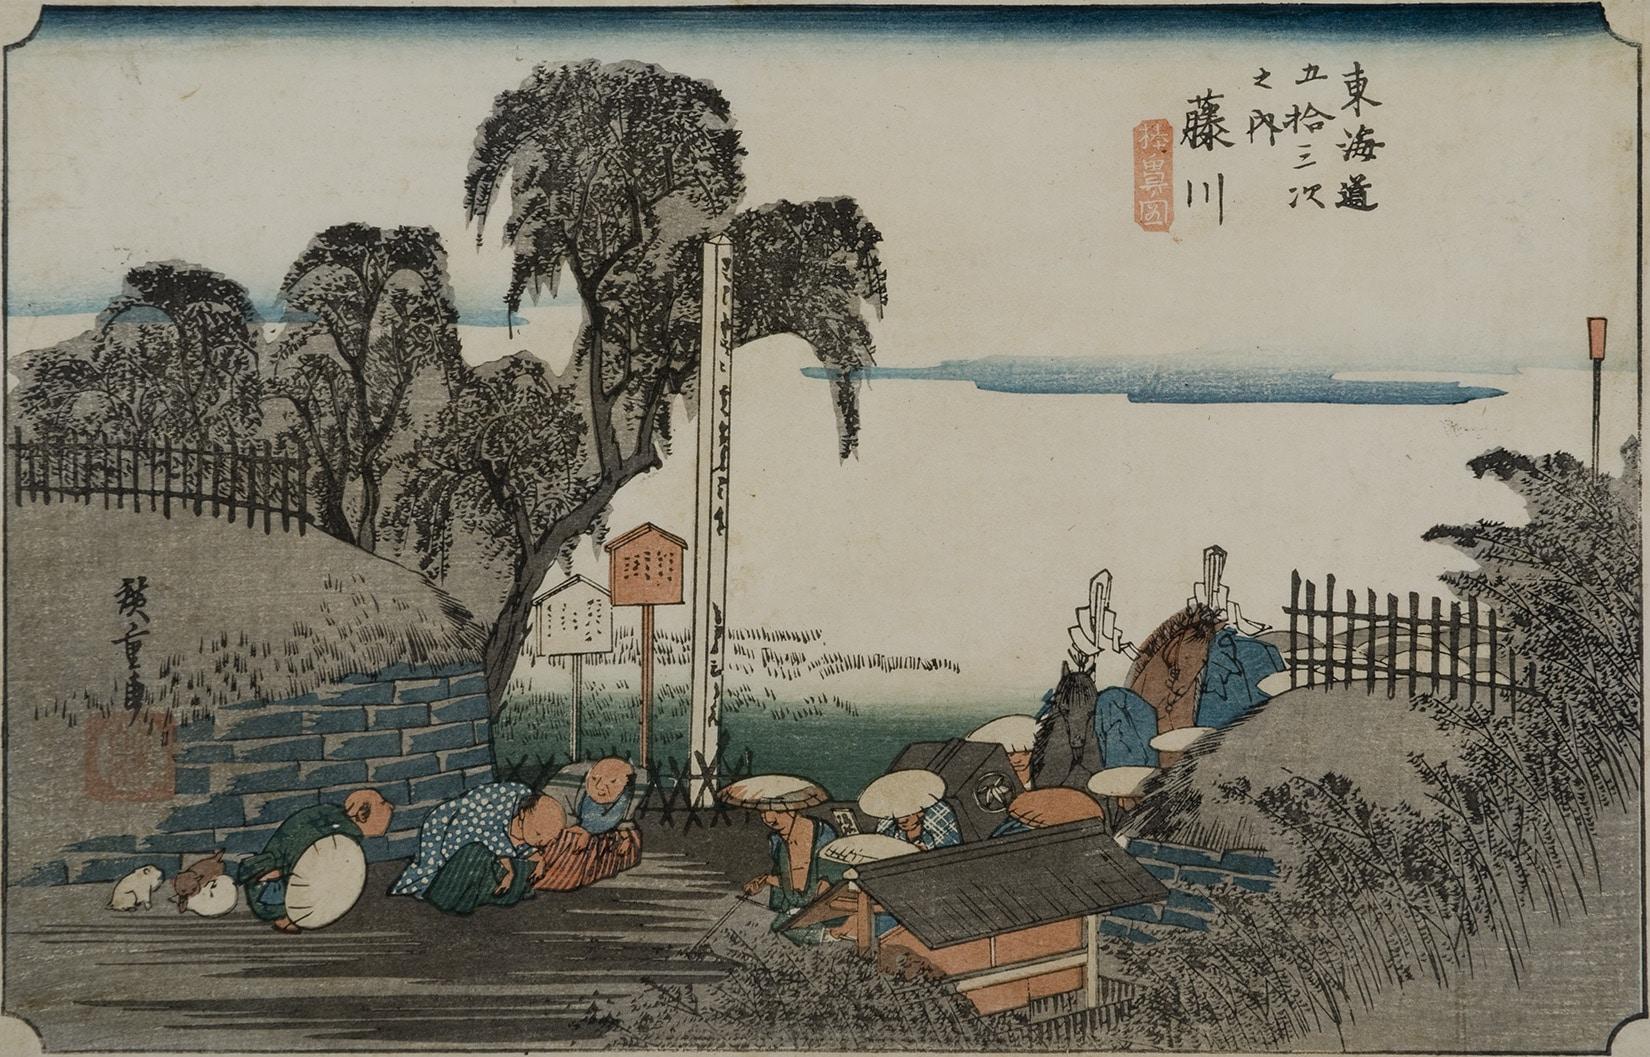 Utagawa Hiroshige, Fujikawa, Scene at Post Outskirts, no. 38 from The Fifty-three Stations of the Tokaido, 1833–34